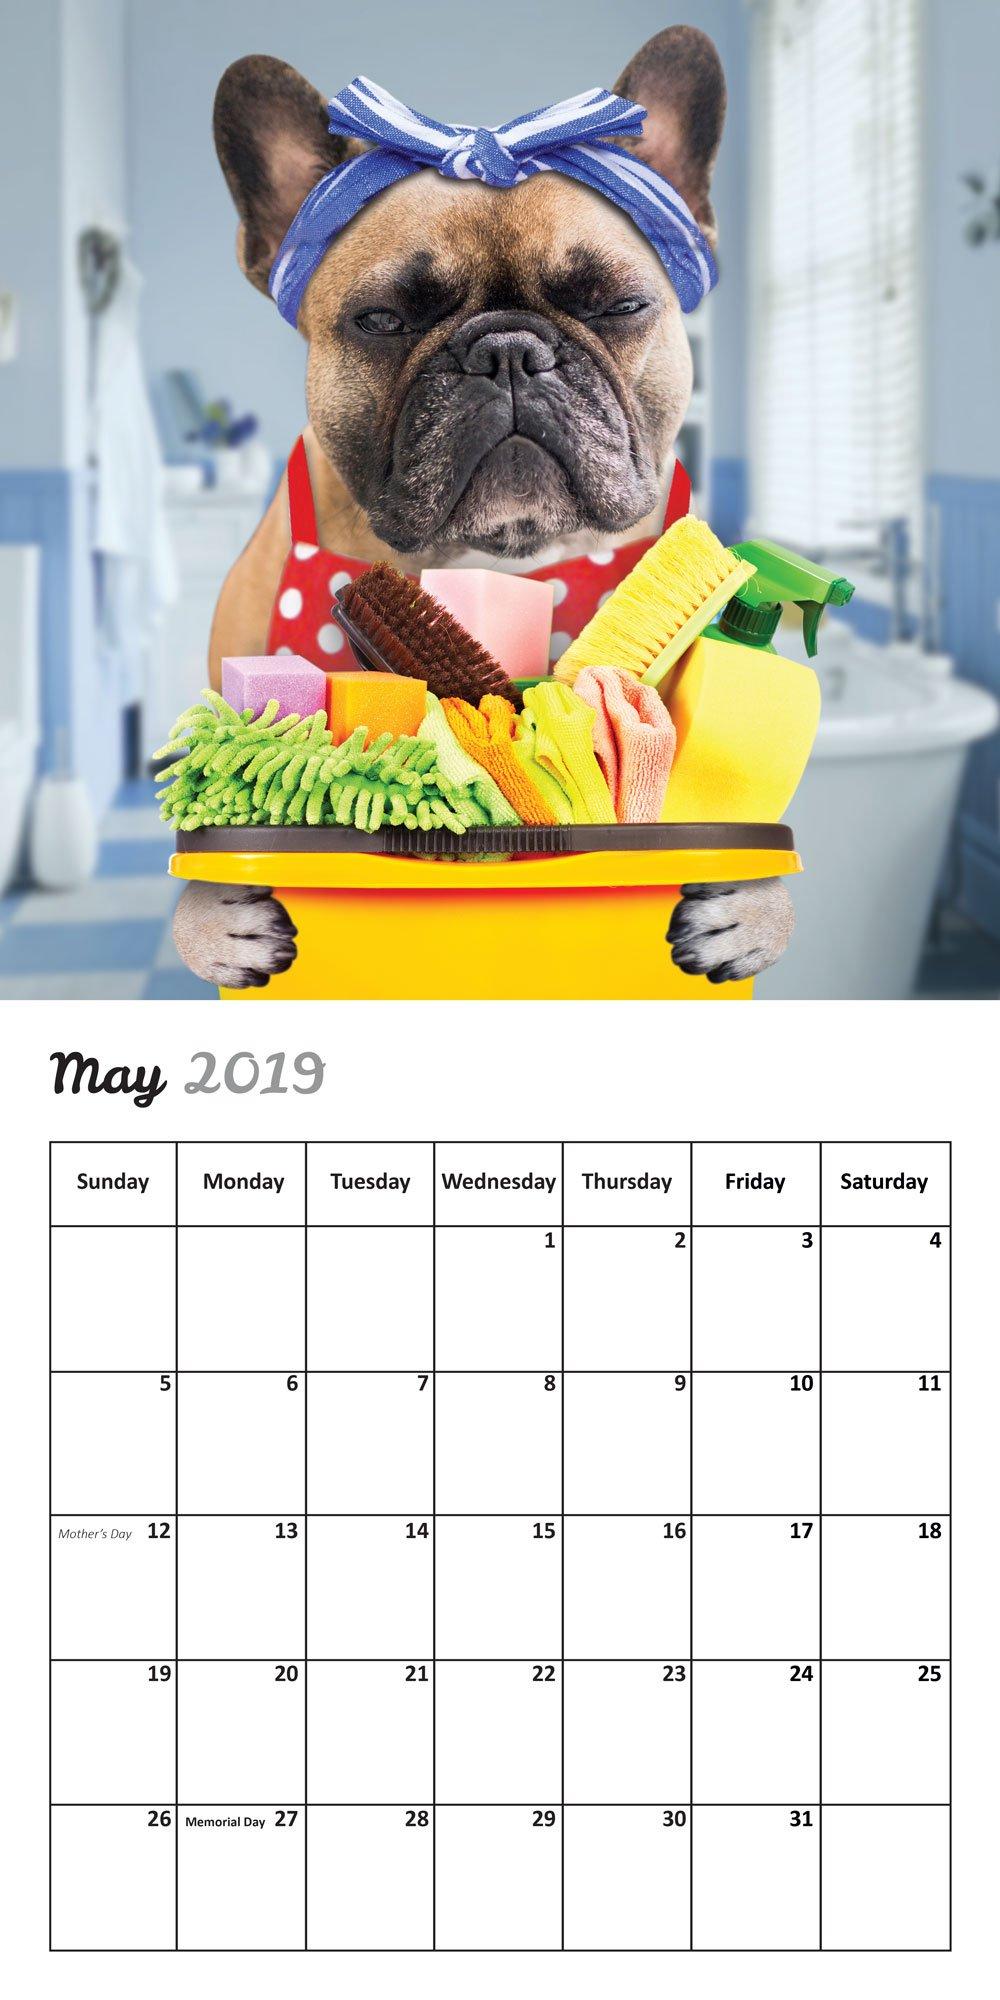 Fun Frenchies 2019 French Bulldog Wall Calendar by Fun Pugs (Image #2)